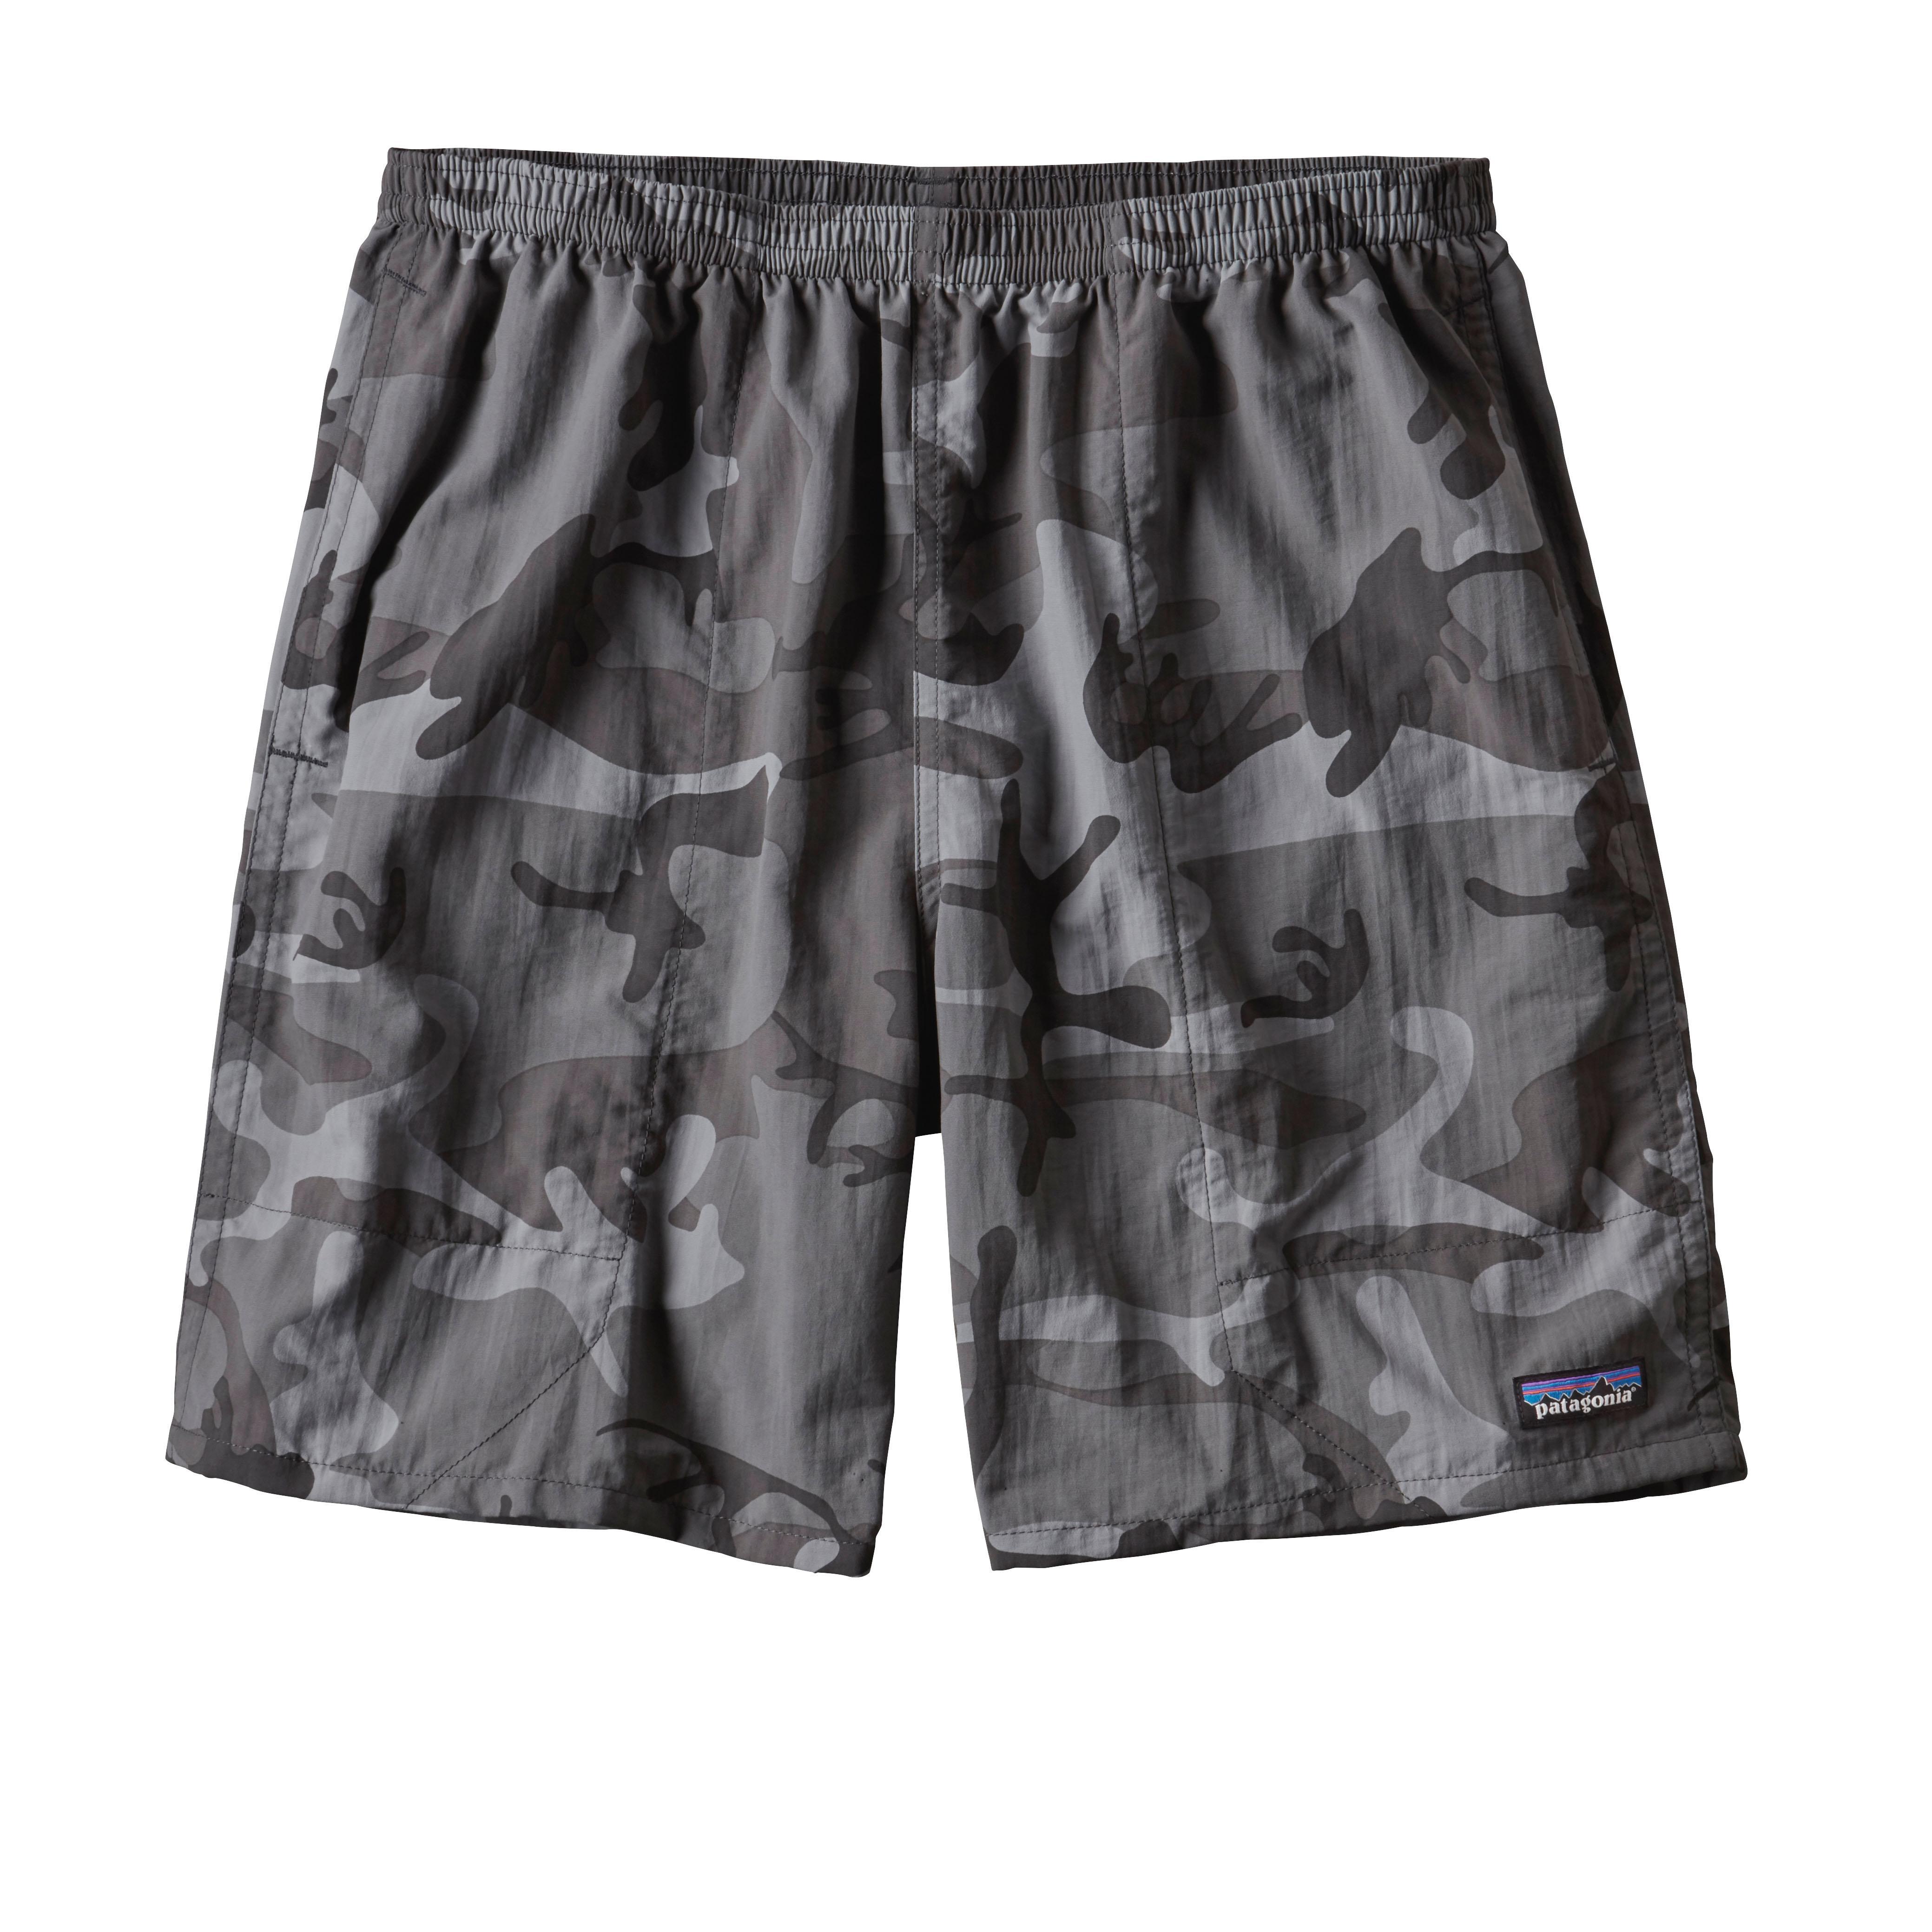 Patagonia Men's Baggies Shorts 7in Inseam FCFG_GREY